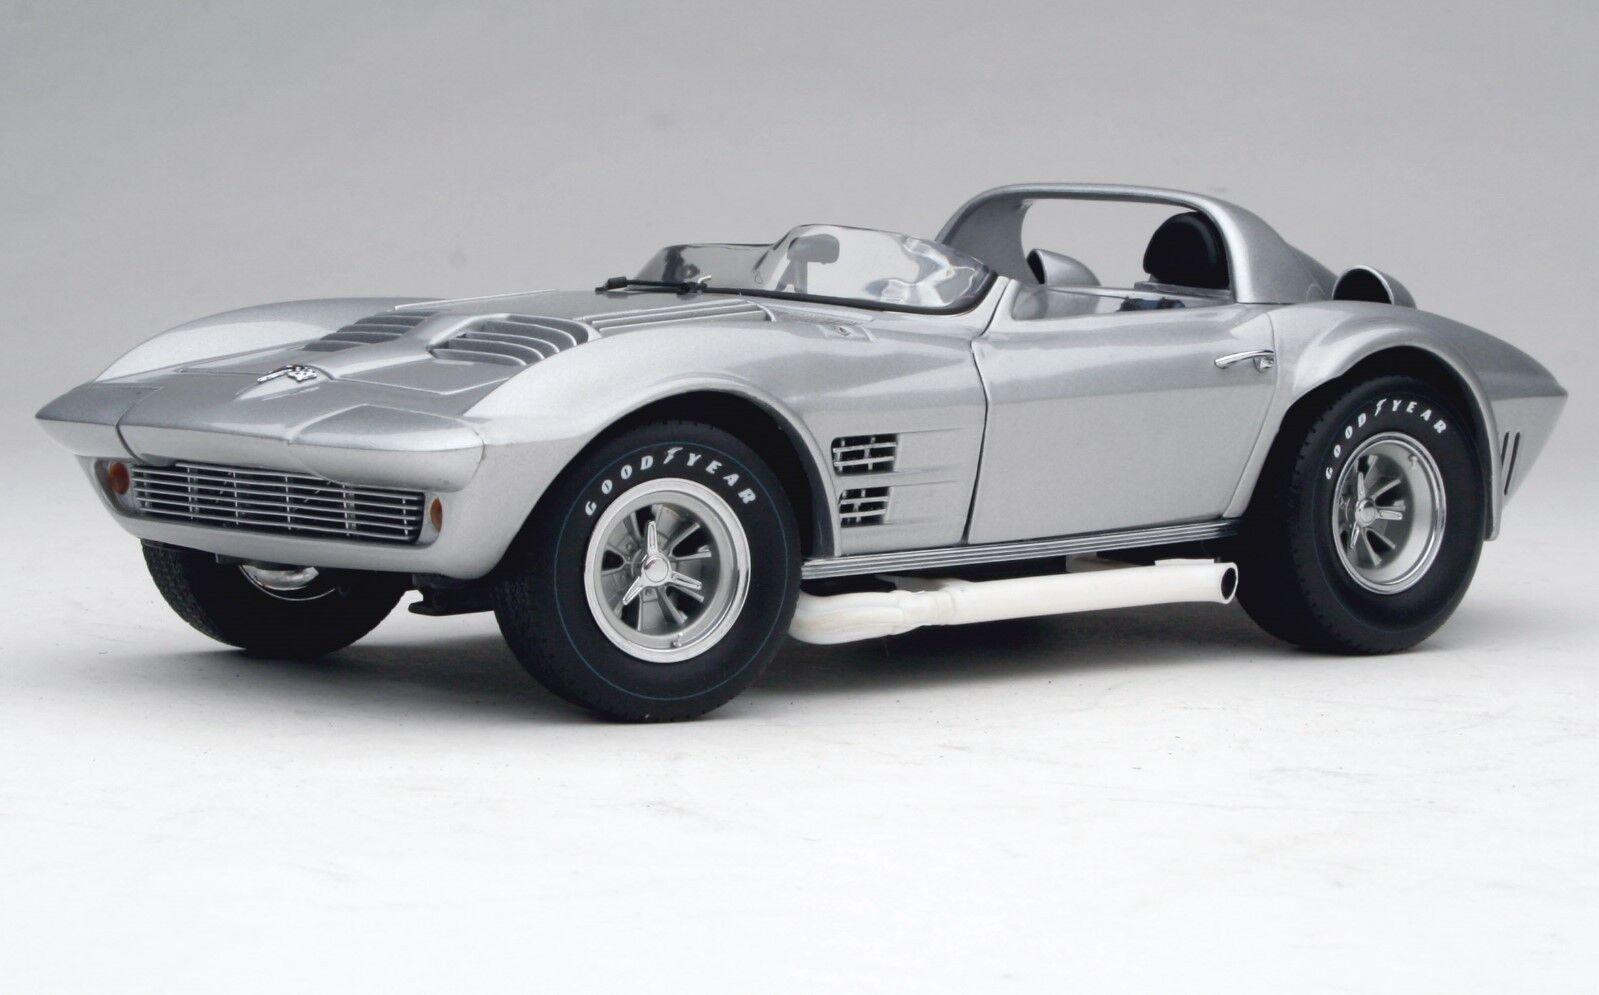 Exoto | Certificado pre-owned Certificado de Autenticidad | 1964 Chevrolet Corvette Grand Sport Roadster